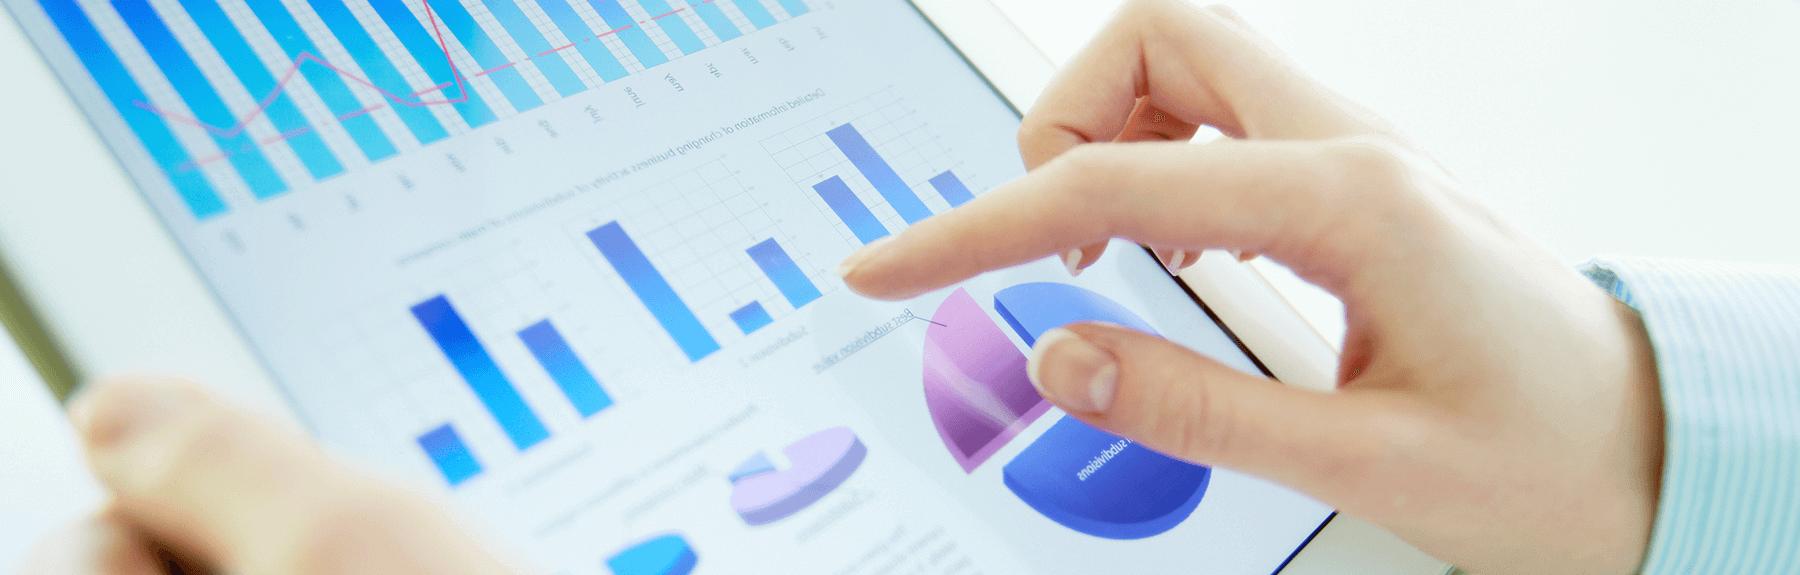 data-visualization-tools-ux-design-header